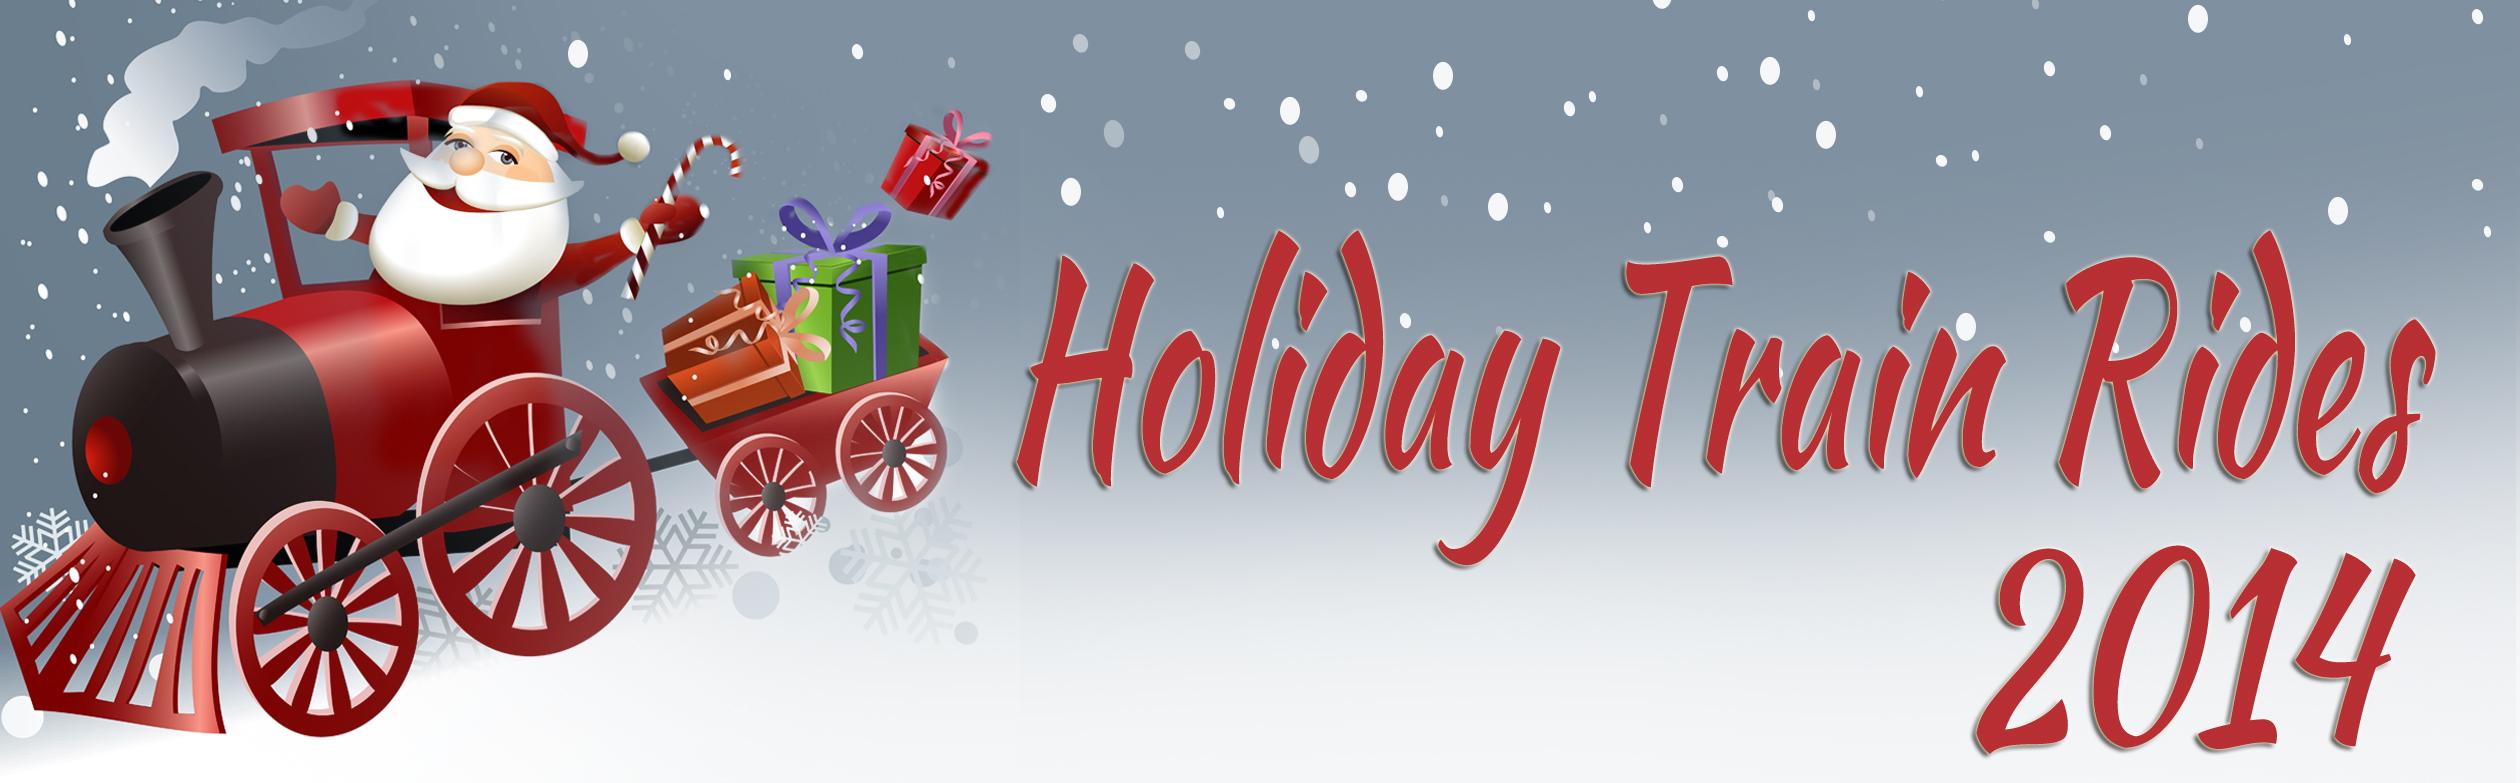 holiday-train-rides-banner.jpg